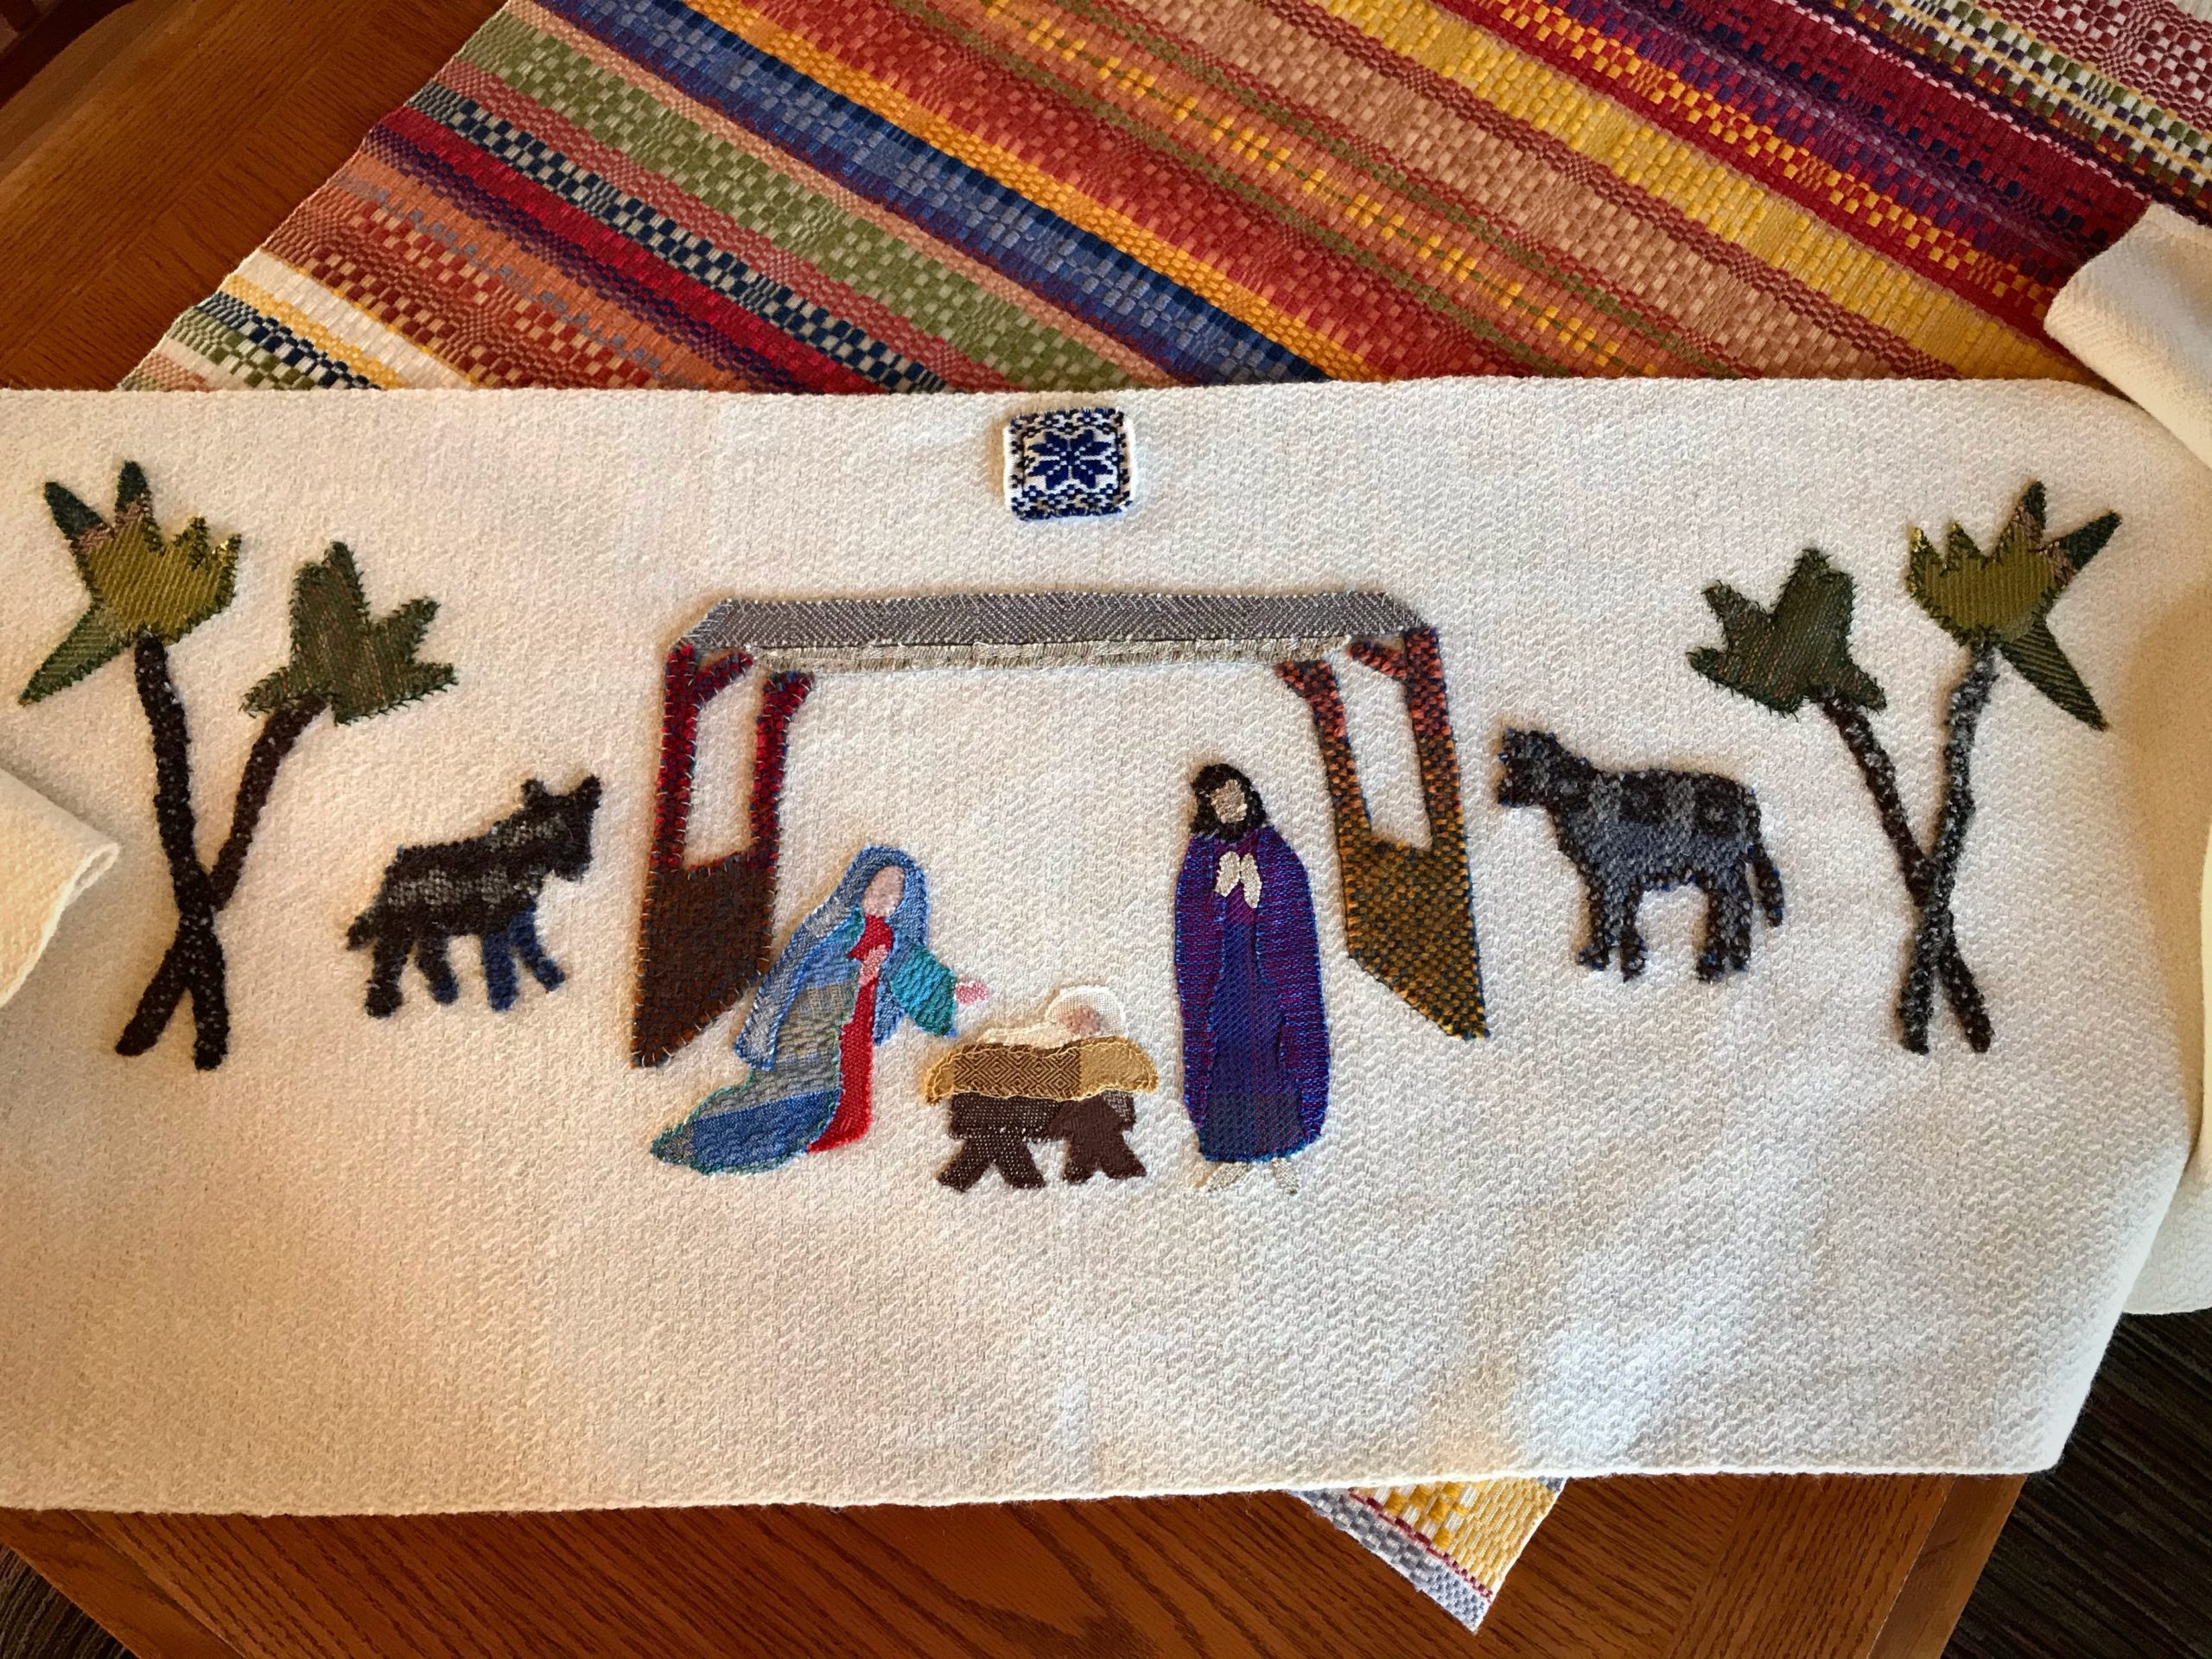 Handwoven Nativity scene.